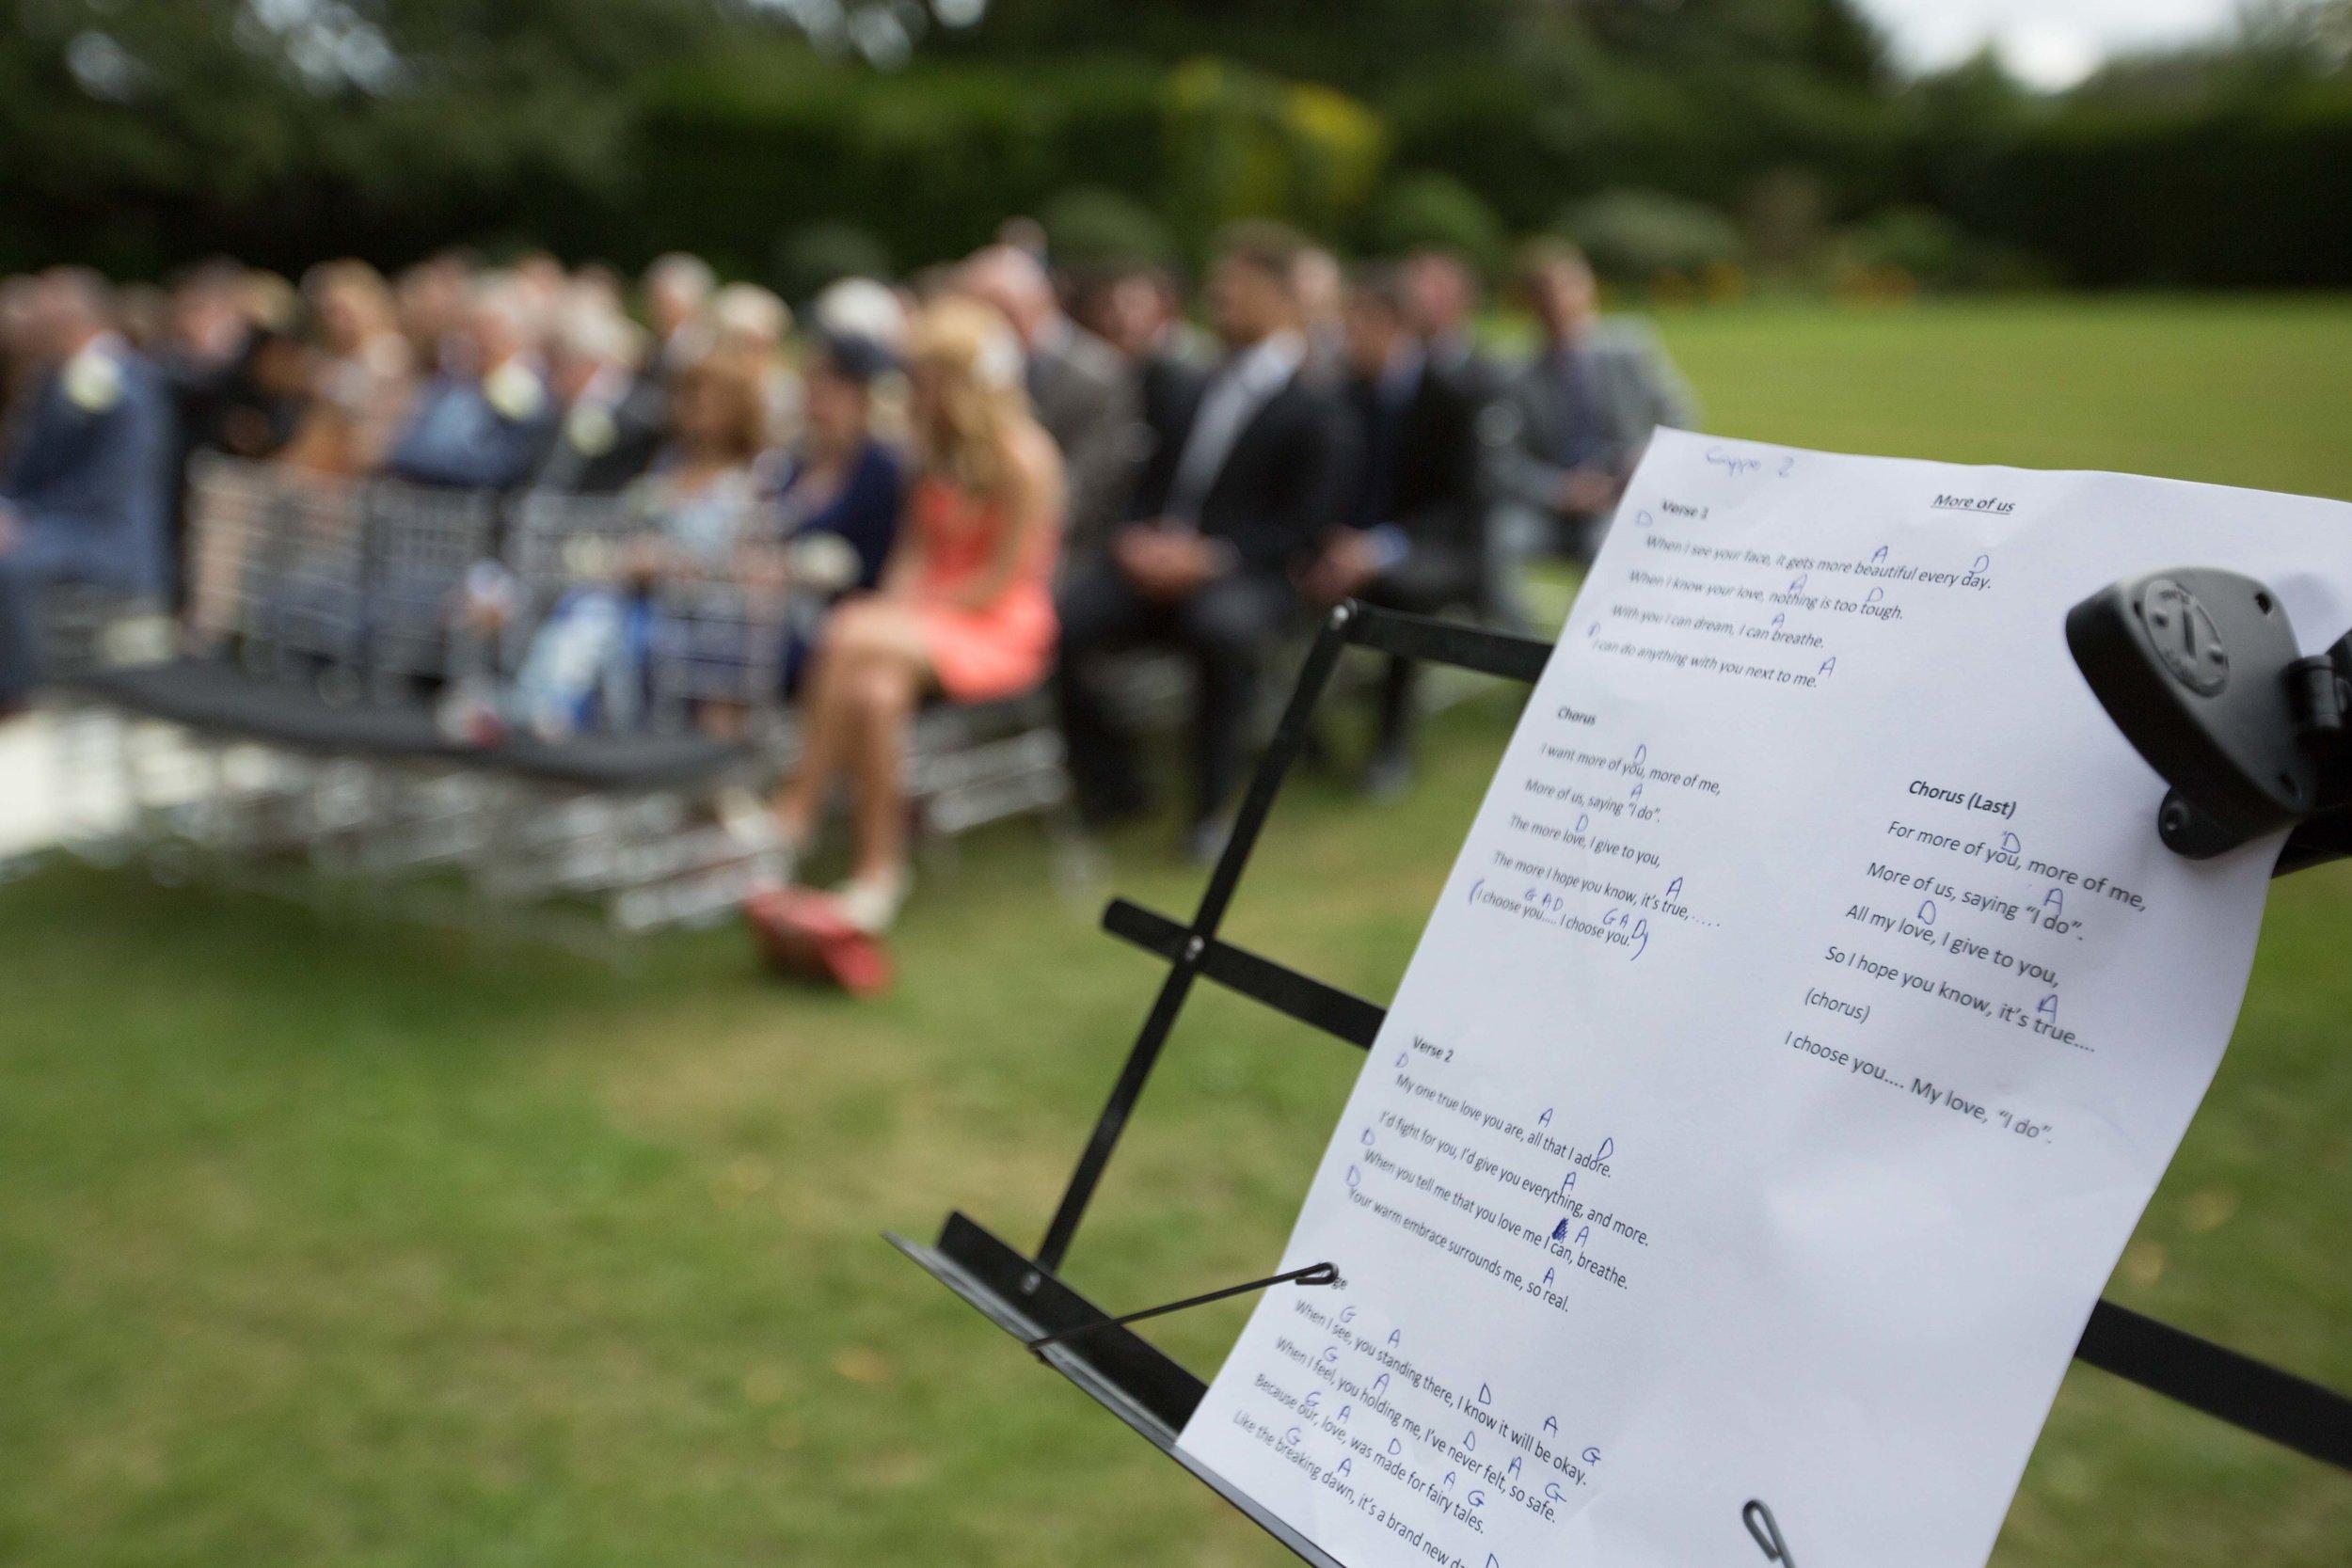 cotswold-wedding-photography-at-stonehouse-court-hotel-natalia-smith-photography-gloucestershire-wedding-photographer-33.jpg